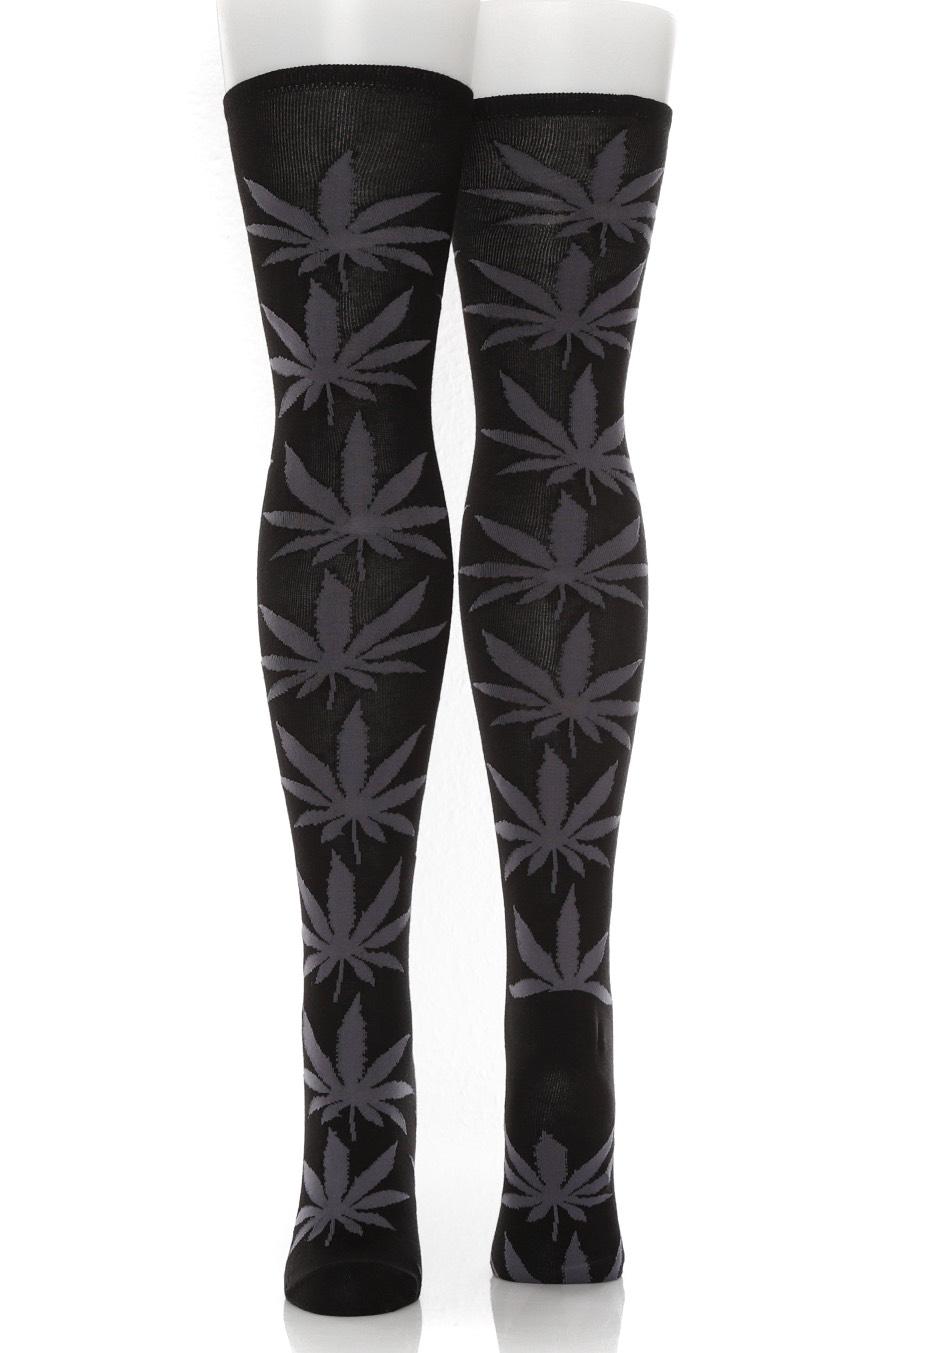 bc1b16609 HUF - Plantlife Thigh High - Zokni - Streetwear Shop - Impericon.com HU